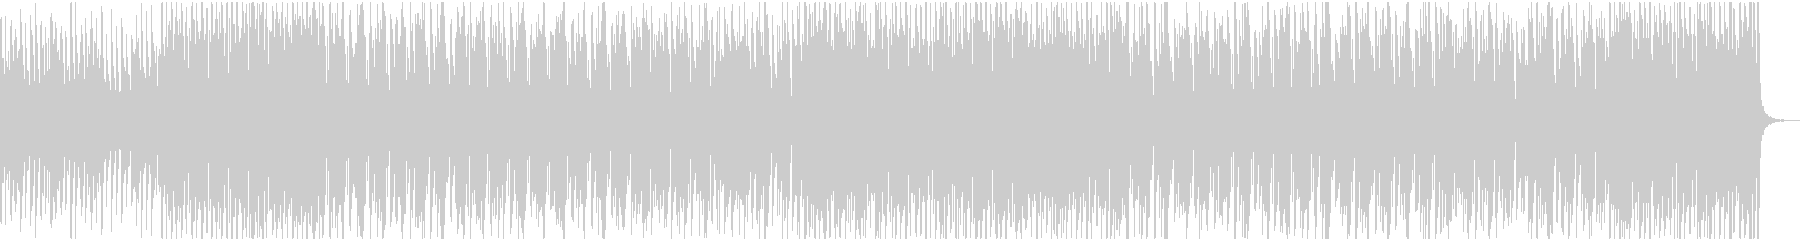 News27 16bit48kHzVerの未再生の波形